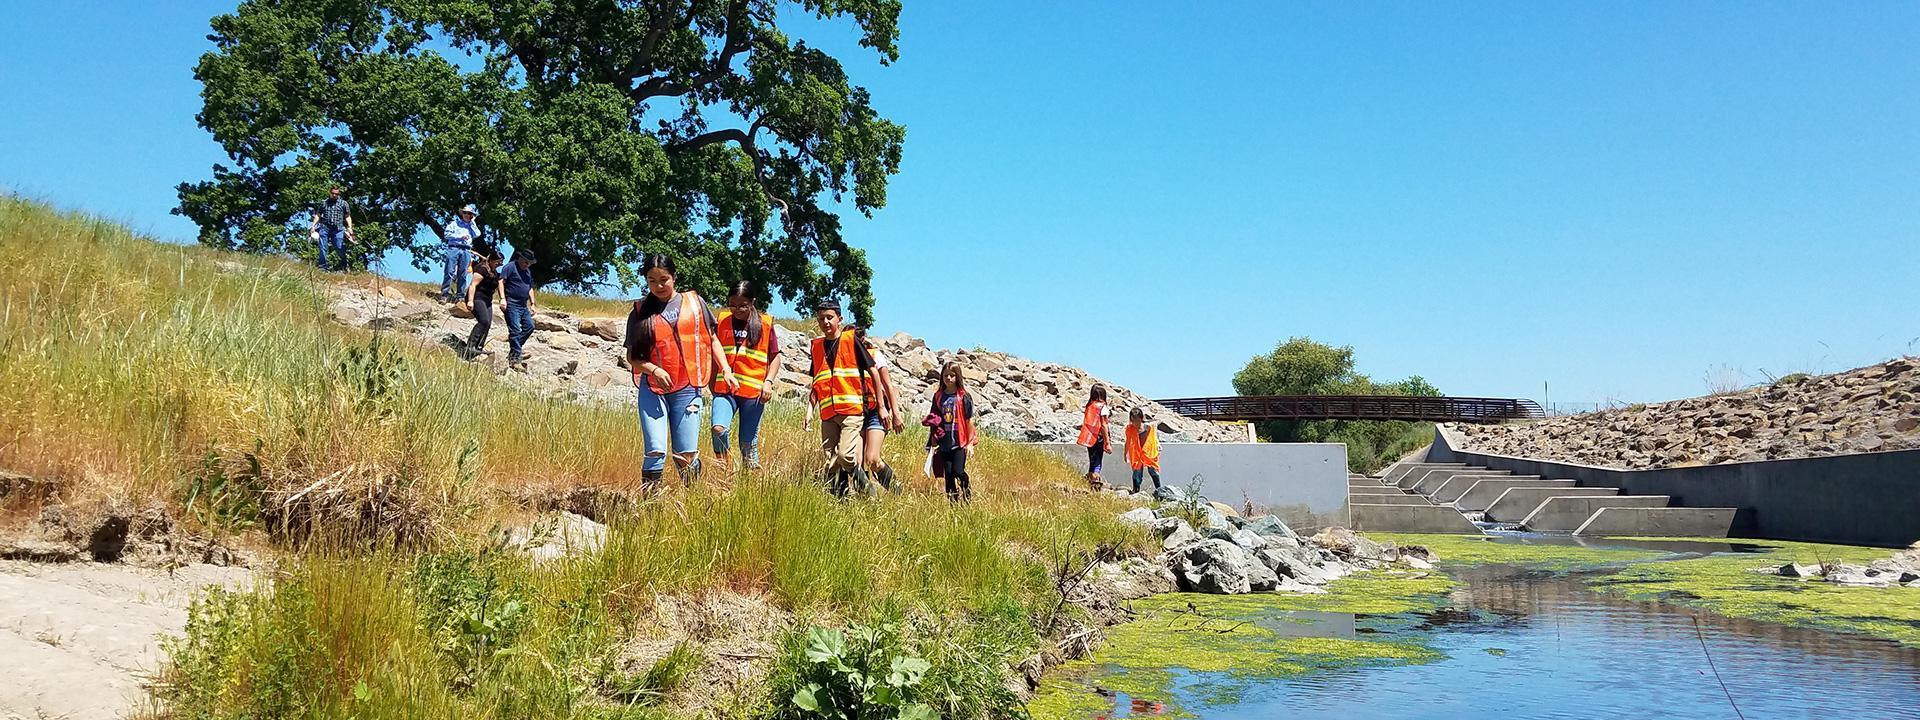 Children wearing orange safety vests walking along a creek